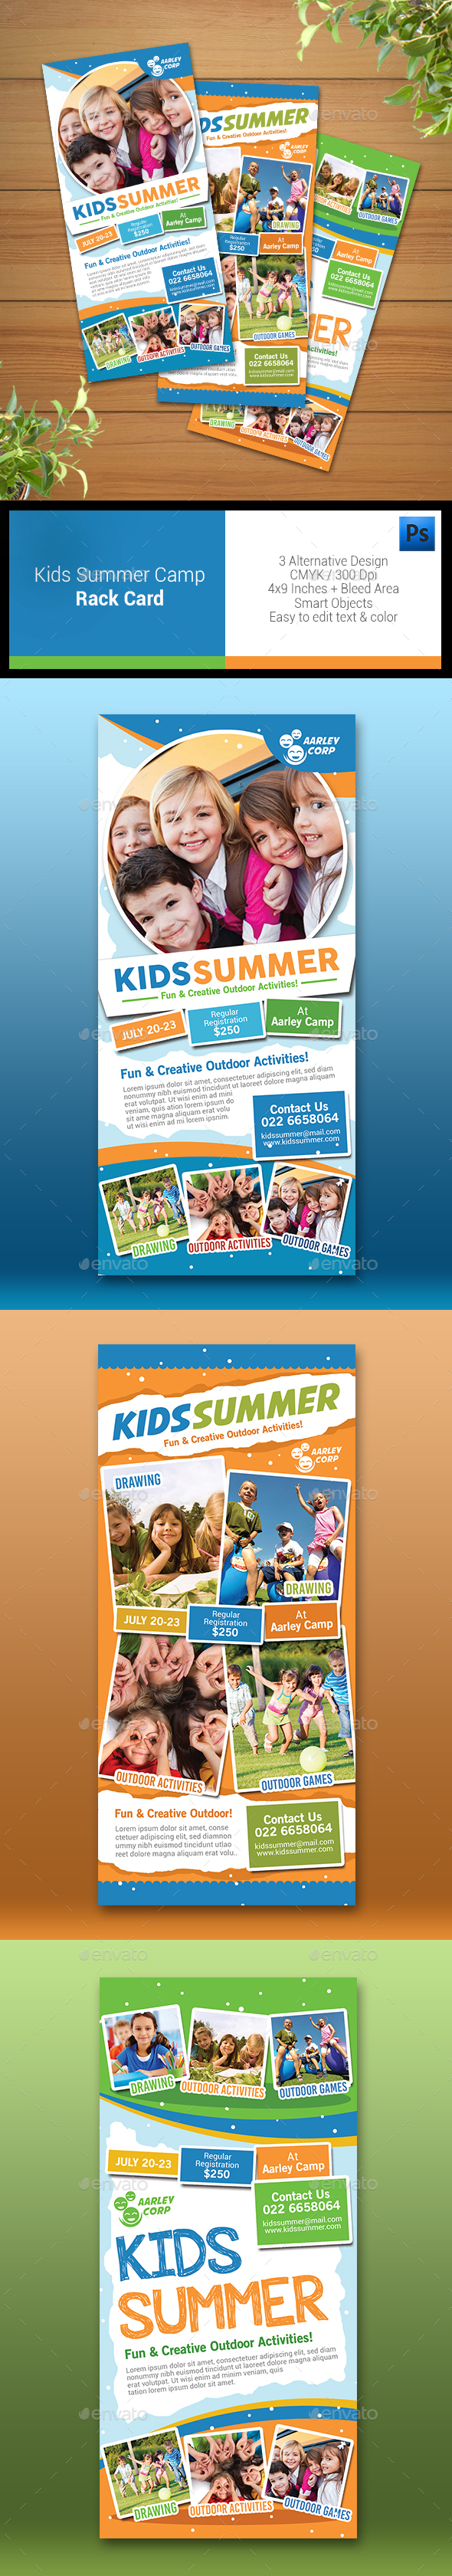 Kids Summer Camp Rack Card - Corporate Business Cards